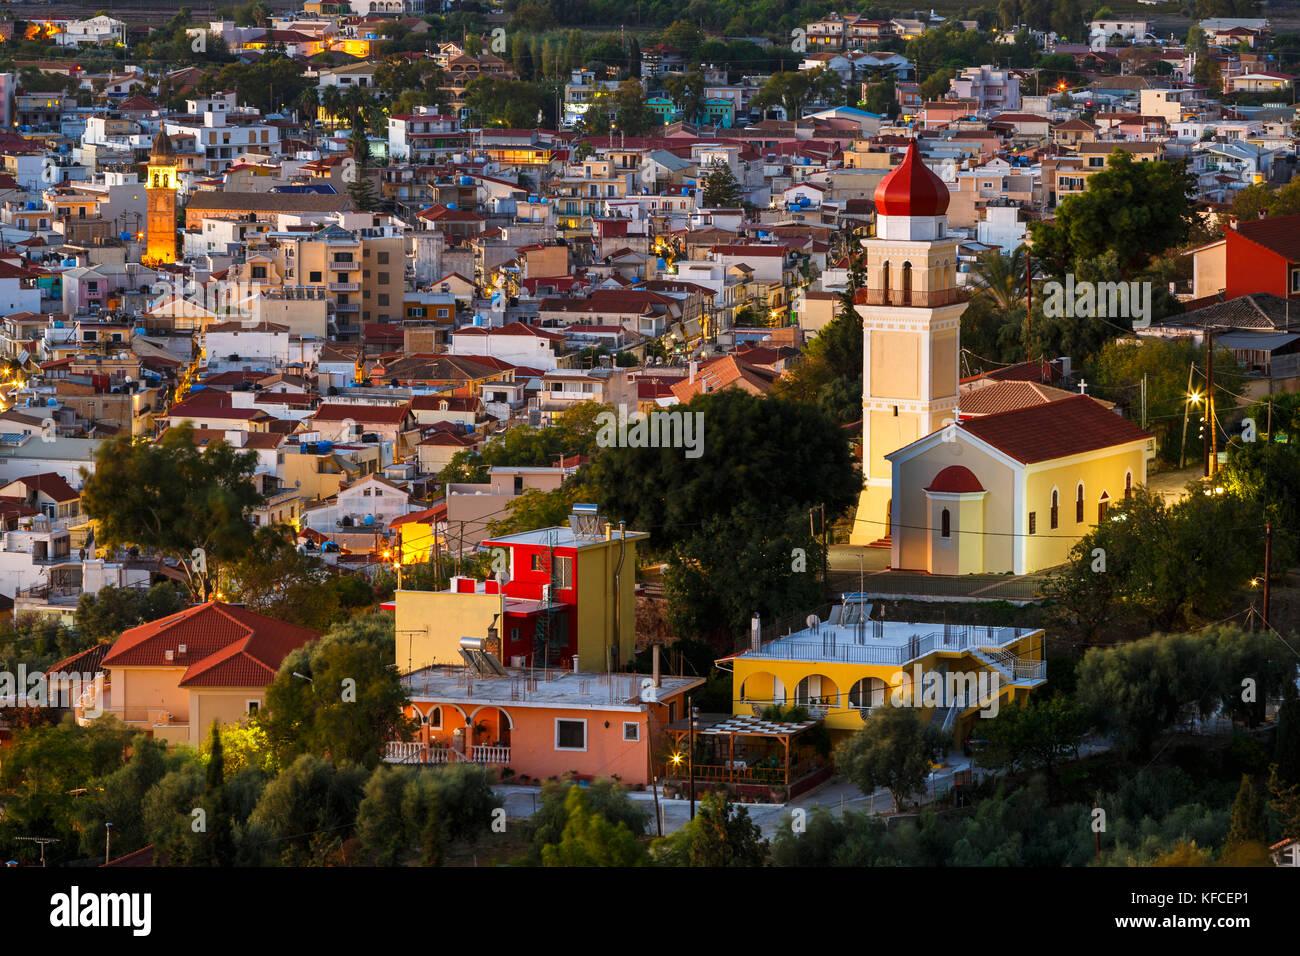 Zakynthos town as seen from Bochali view point, Greece. - Stock Image